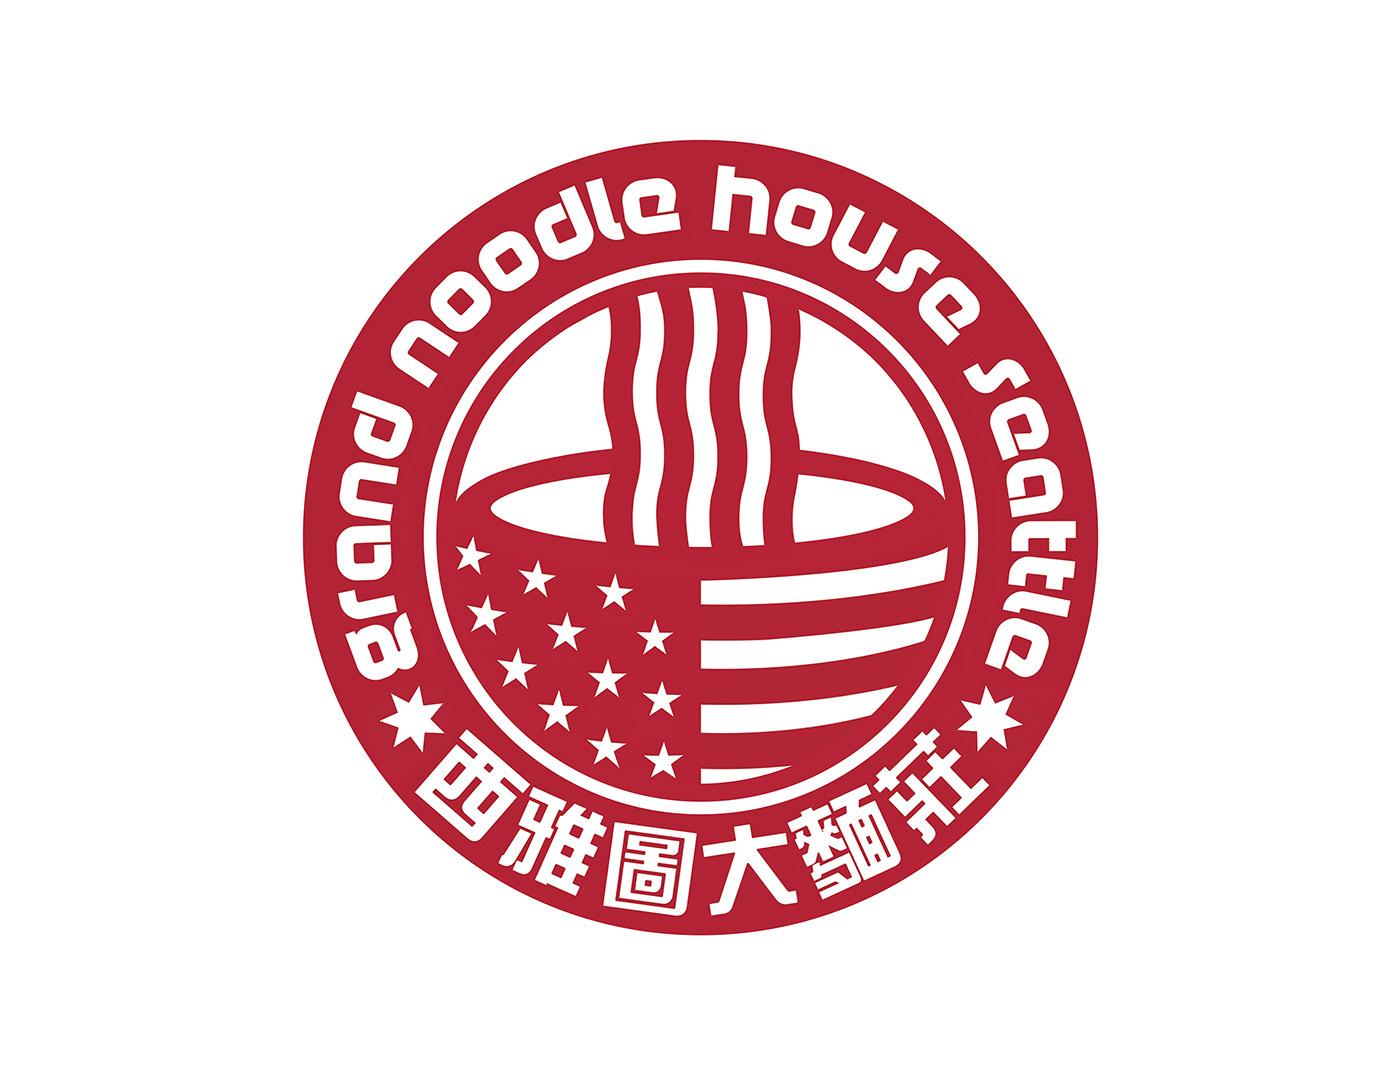 Identity Design logo LogoLounge logolounge 12 PING XU PXSTUDIO Trade mark